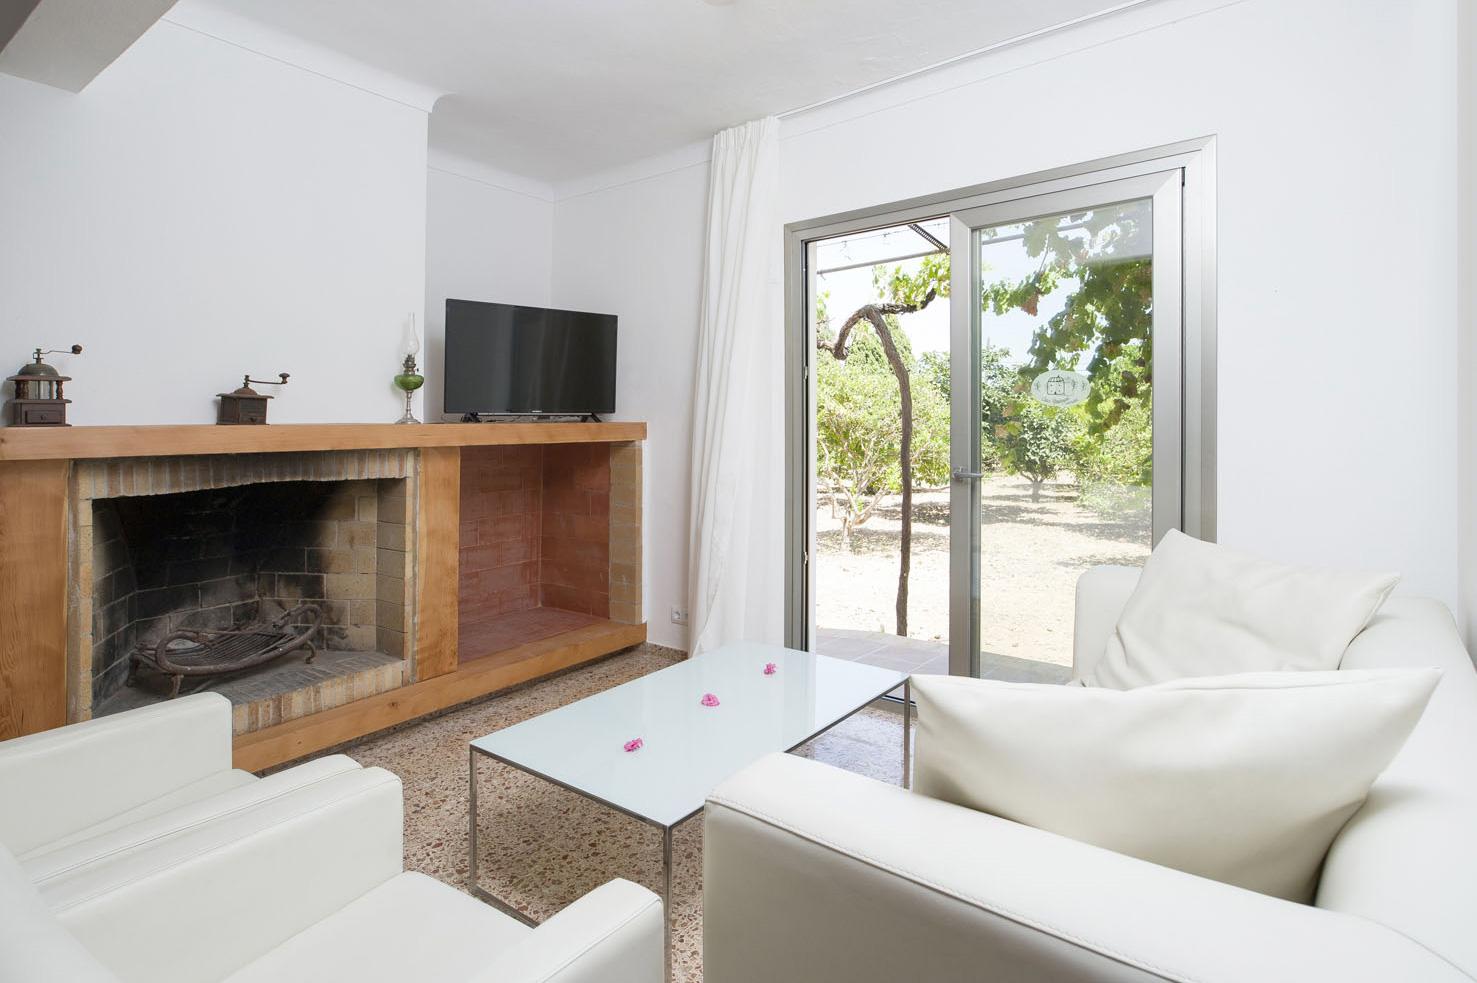 https://www.apartamentosbonsol-ibiza.com/wp-content/uploads/2019/02/cancama_02.jpg